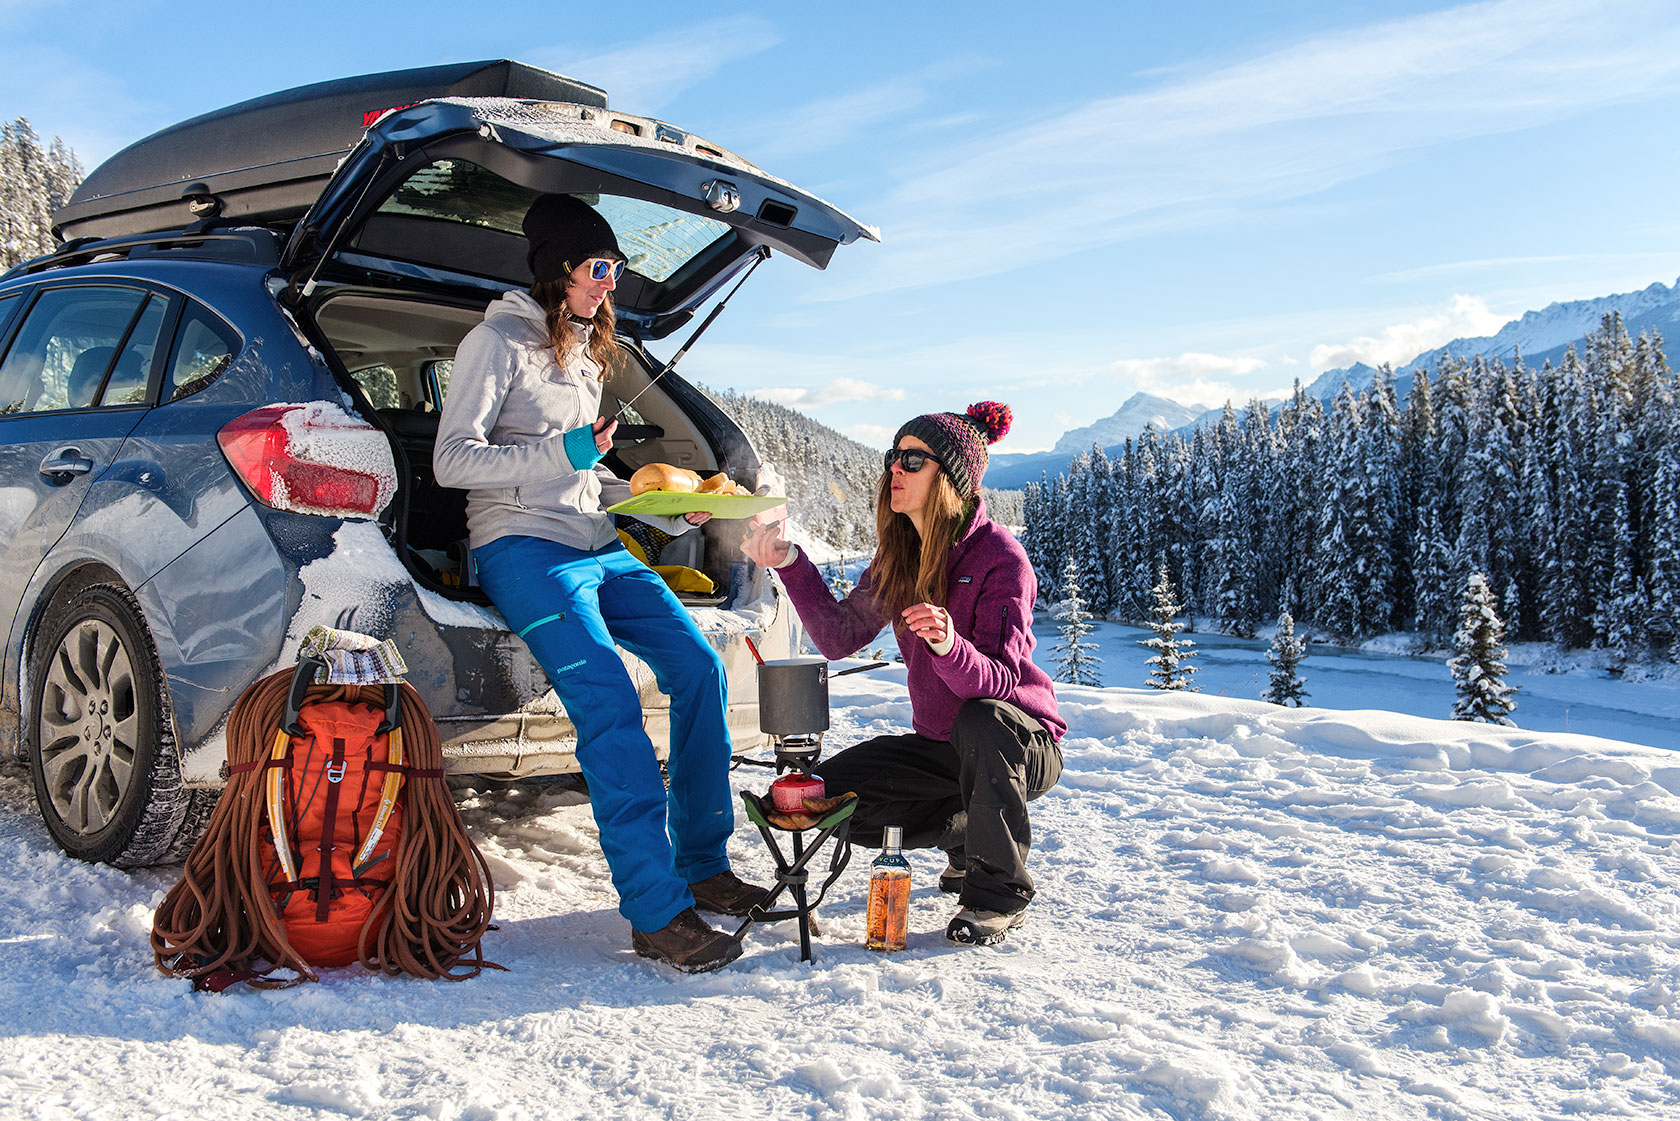 austin-trigg-patagonia-banff-alberta-winter-canada-trip-adventure-outside-snow-forest-morants-curve-fondue-roadside-cooking-car-lifestyle.jpg